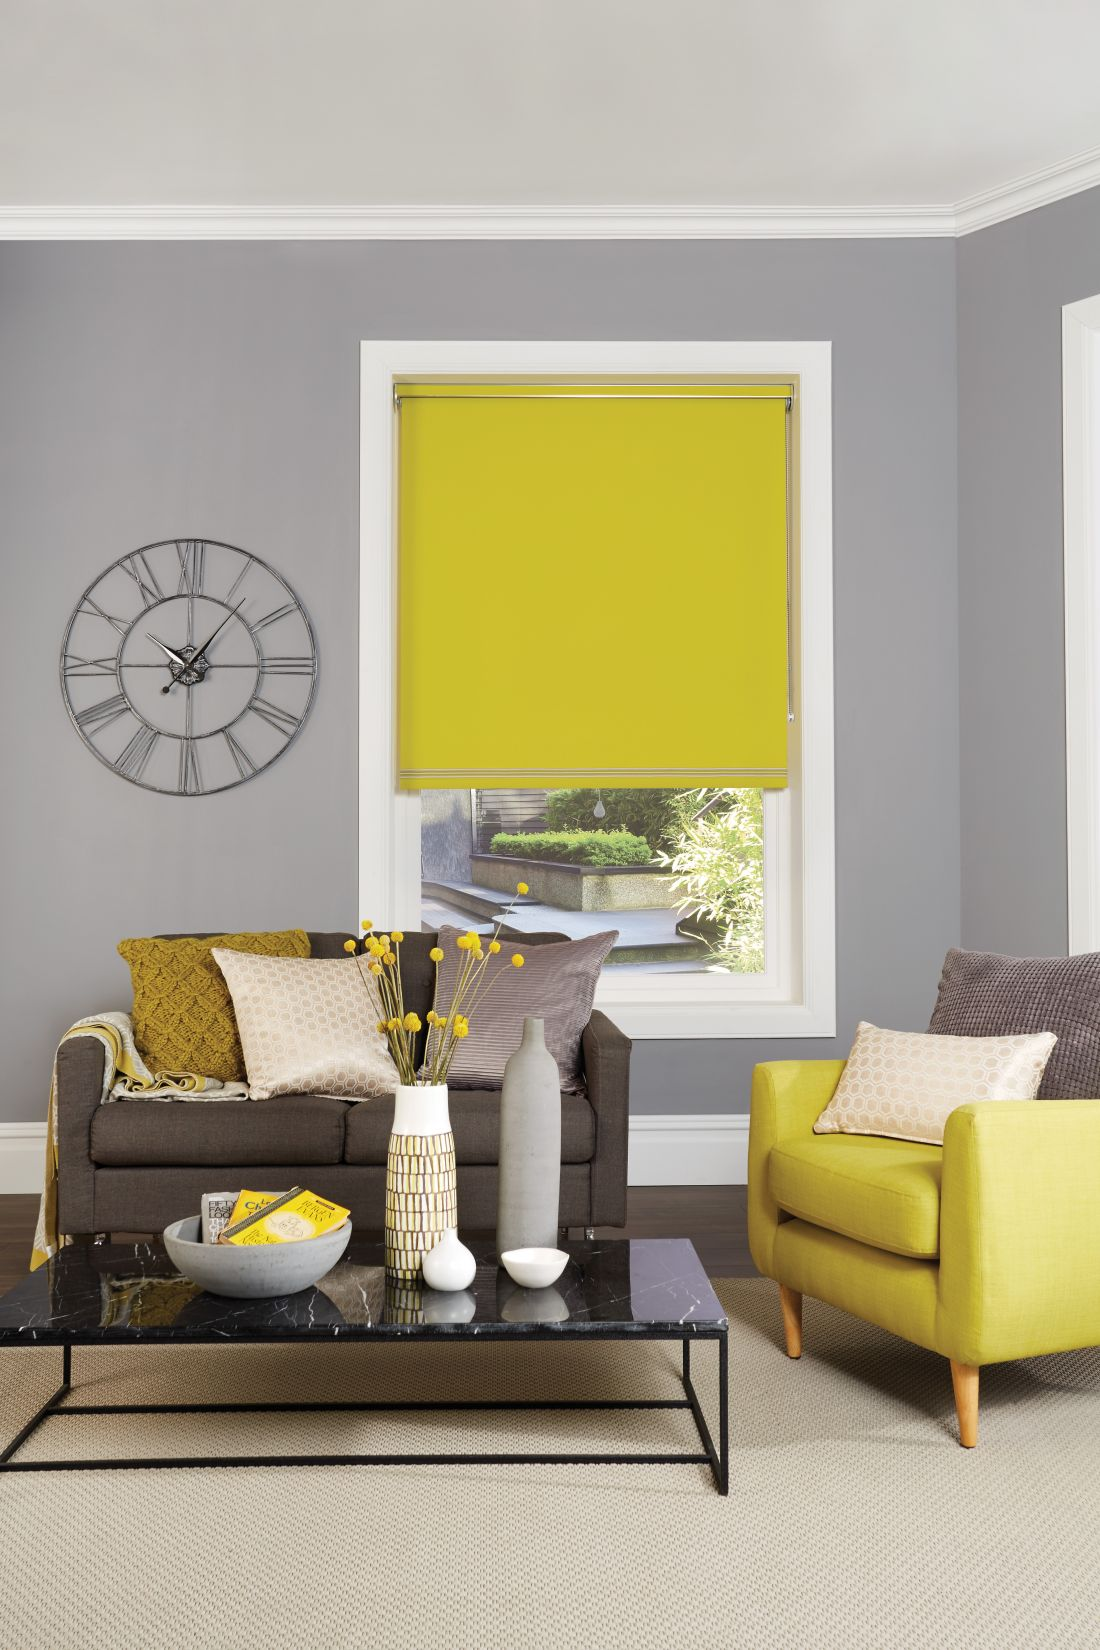 12english-blinds_yellow-blinds-living-room-roller-blinds.jpg